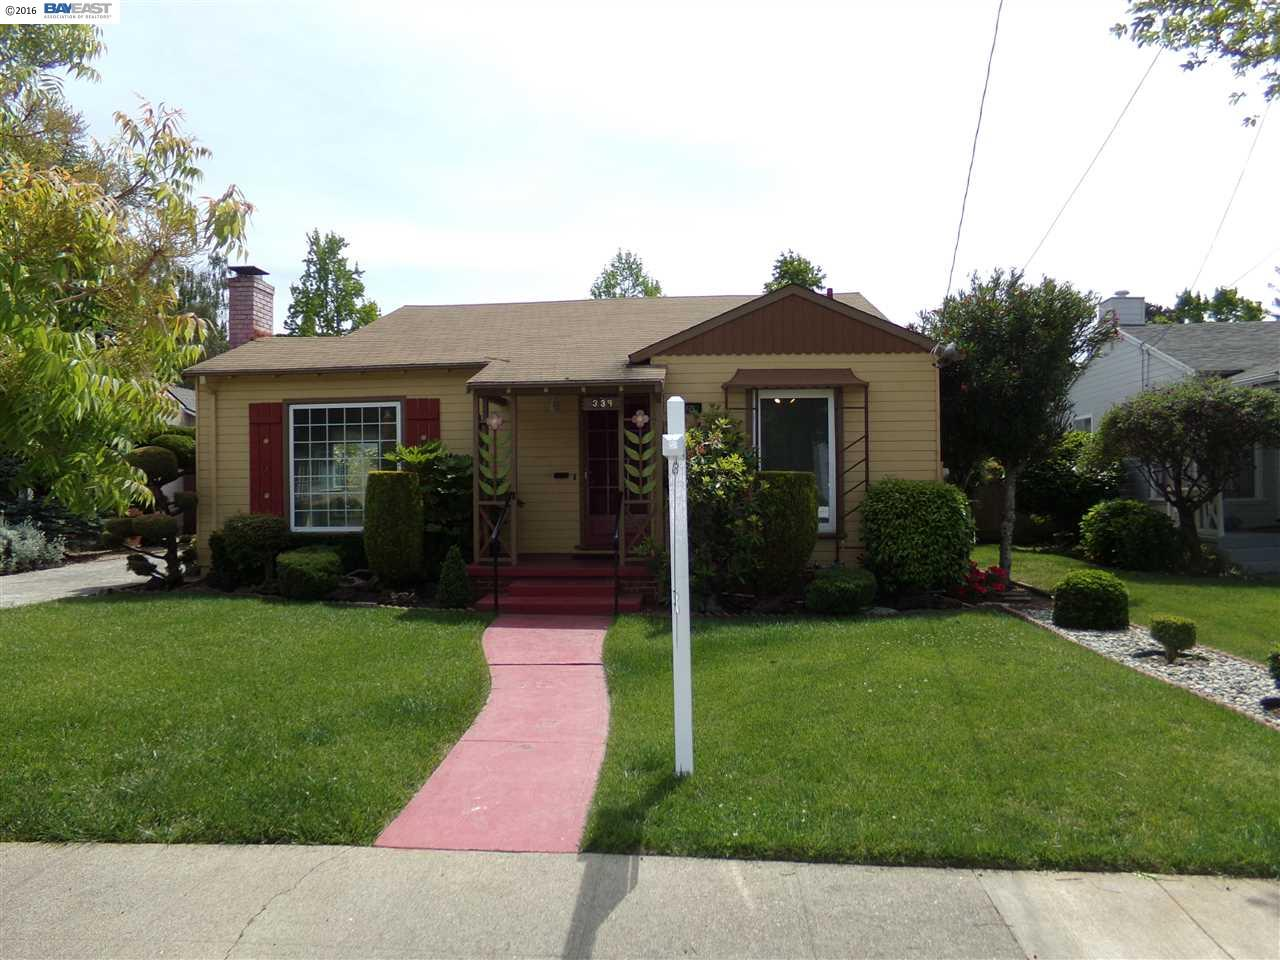 339 Covington St, Oakland, CA